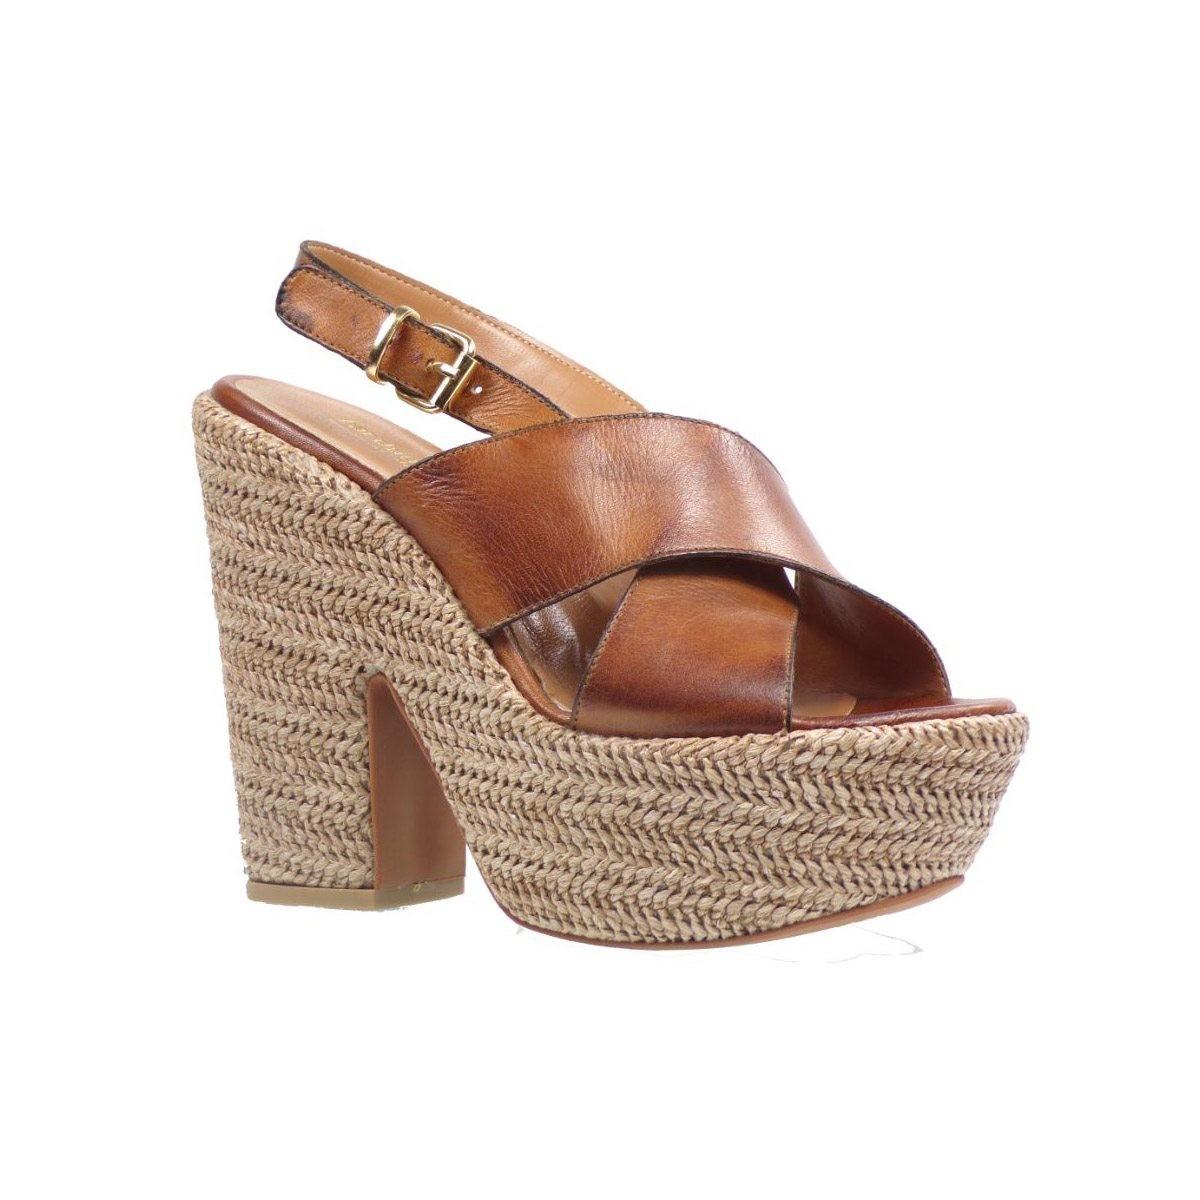 Fardoulis shoes Γυναικείες Πλατφόρμες 1401 Ταμπά Fardoulis shoes 1401 Tampa